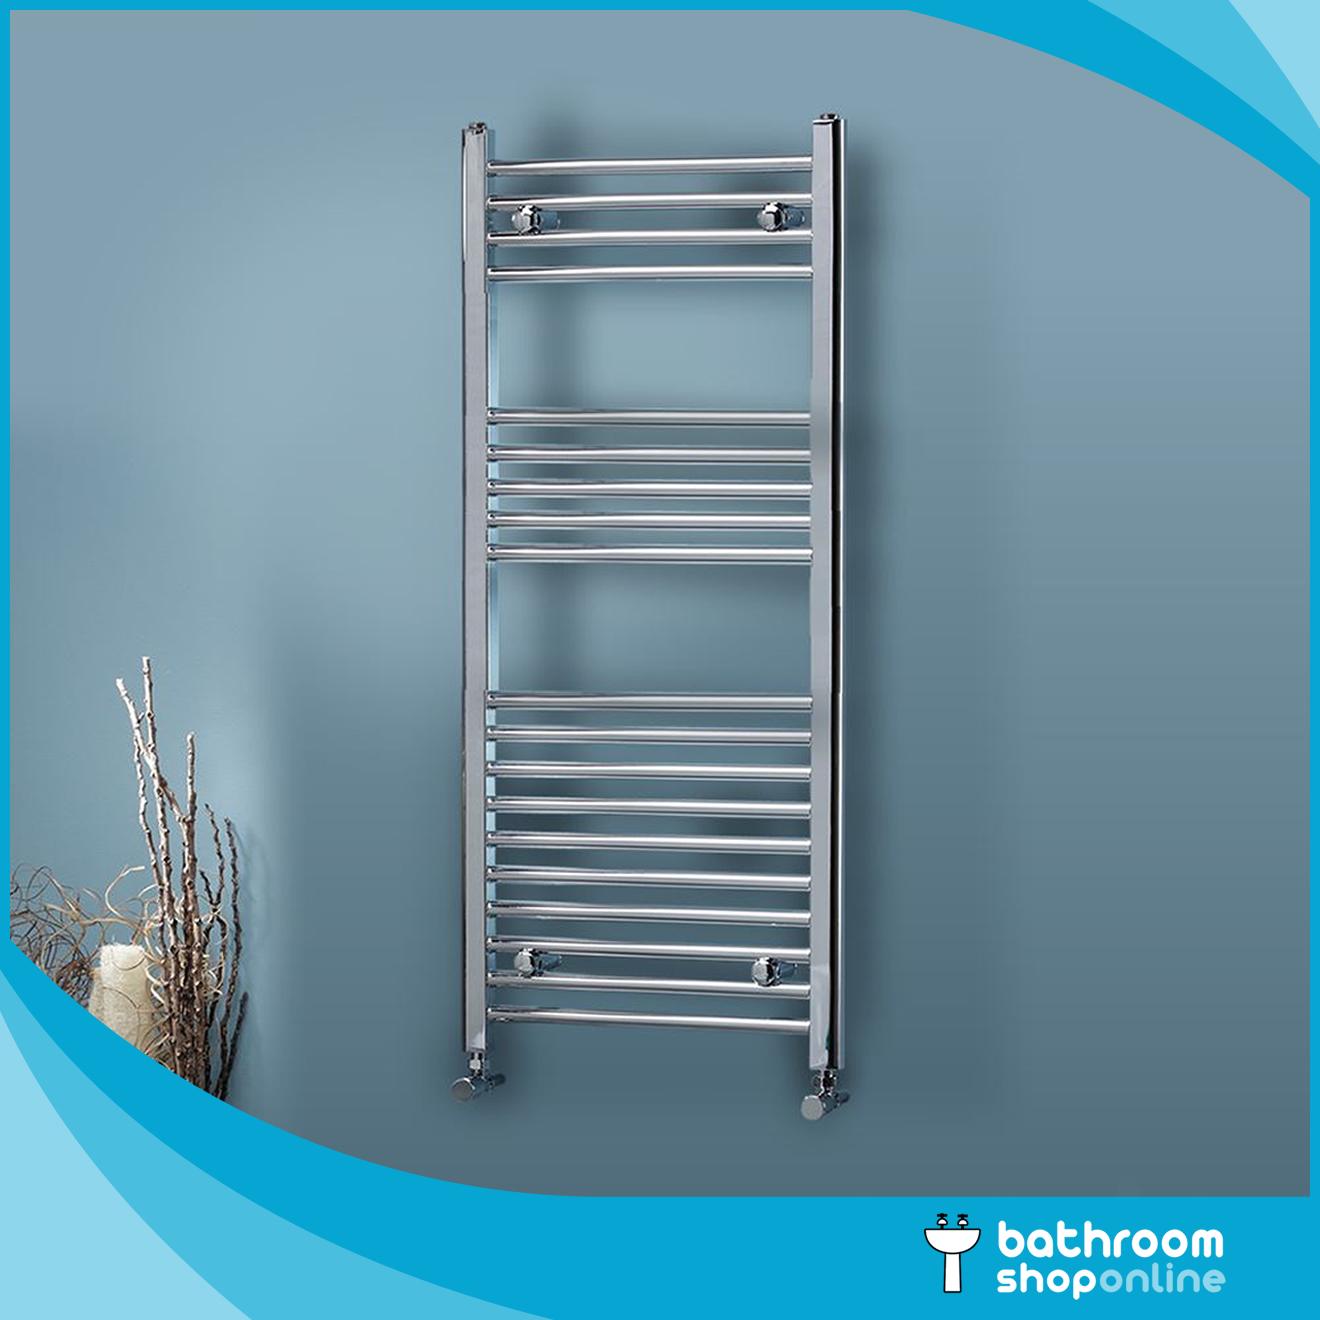 Chrome Heated Towel Rail Rad Radiator Bathroom Central Heating Flat ...